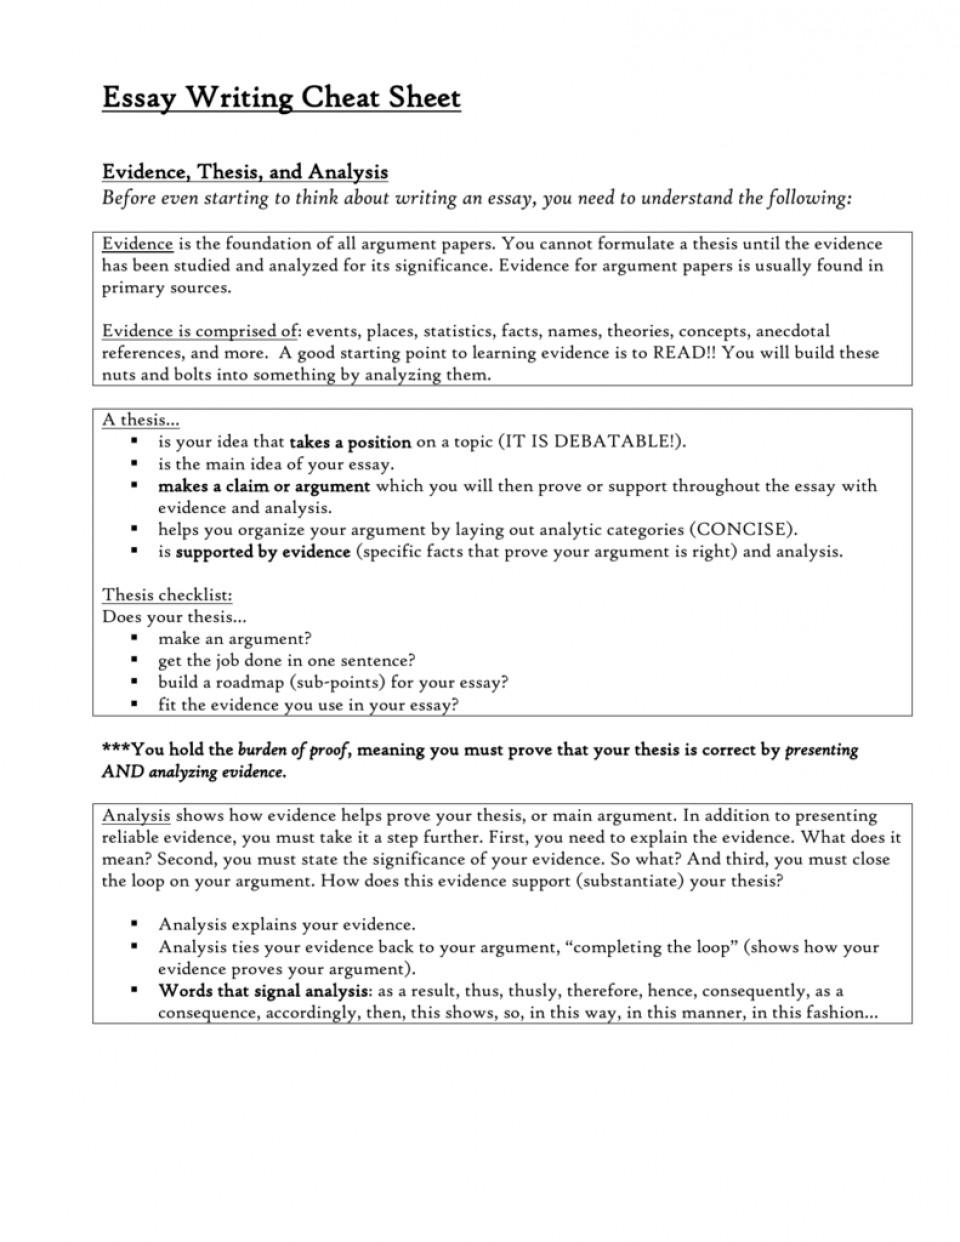 020 008012620 1 Essay Example Sensational Fit Deadline Advertising And Marketing Fashion Merchandising 960